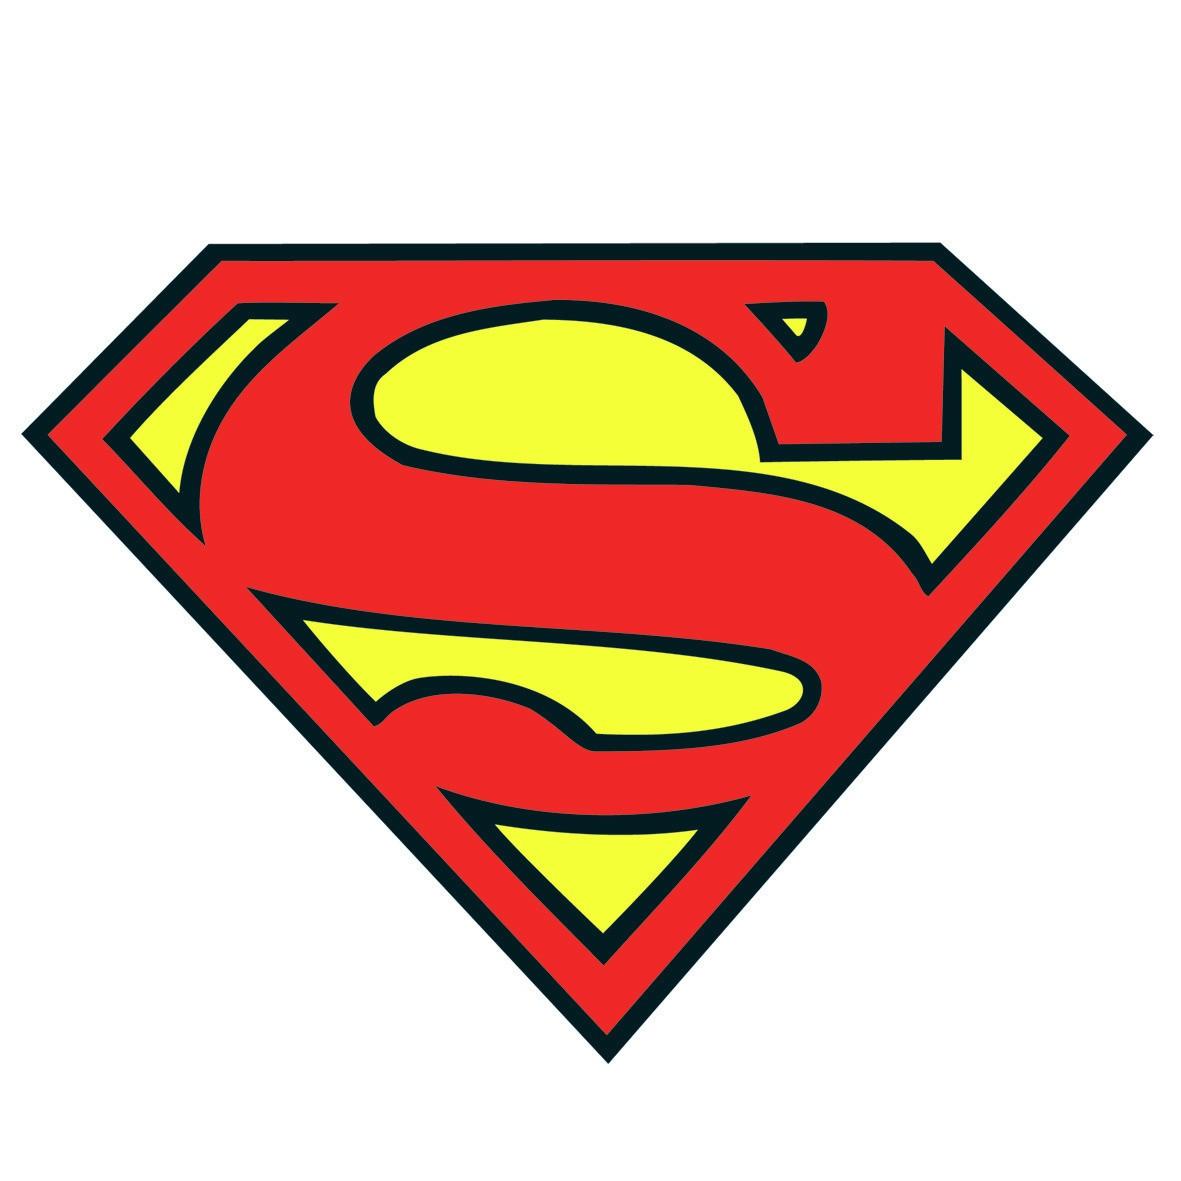 Superman logo clip art free clipart images